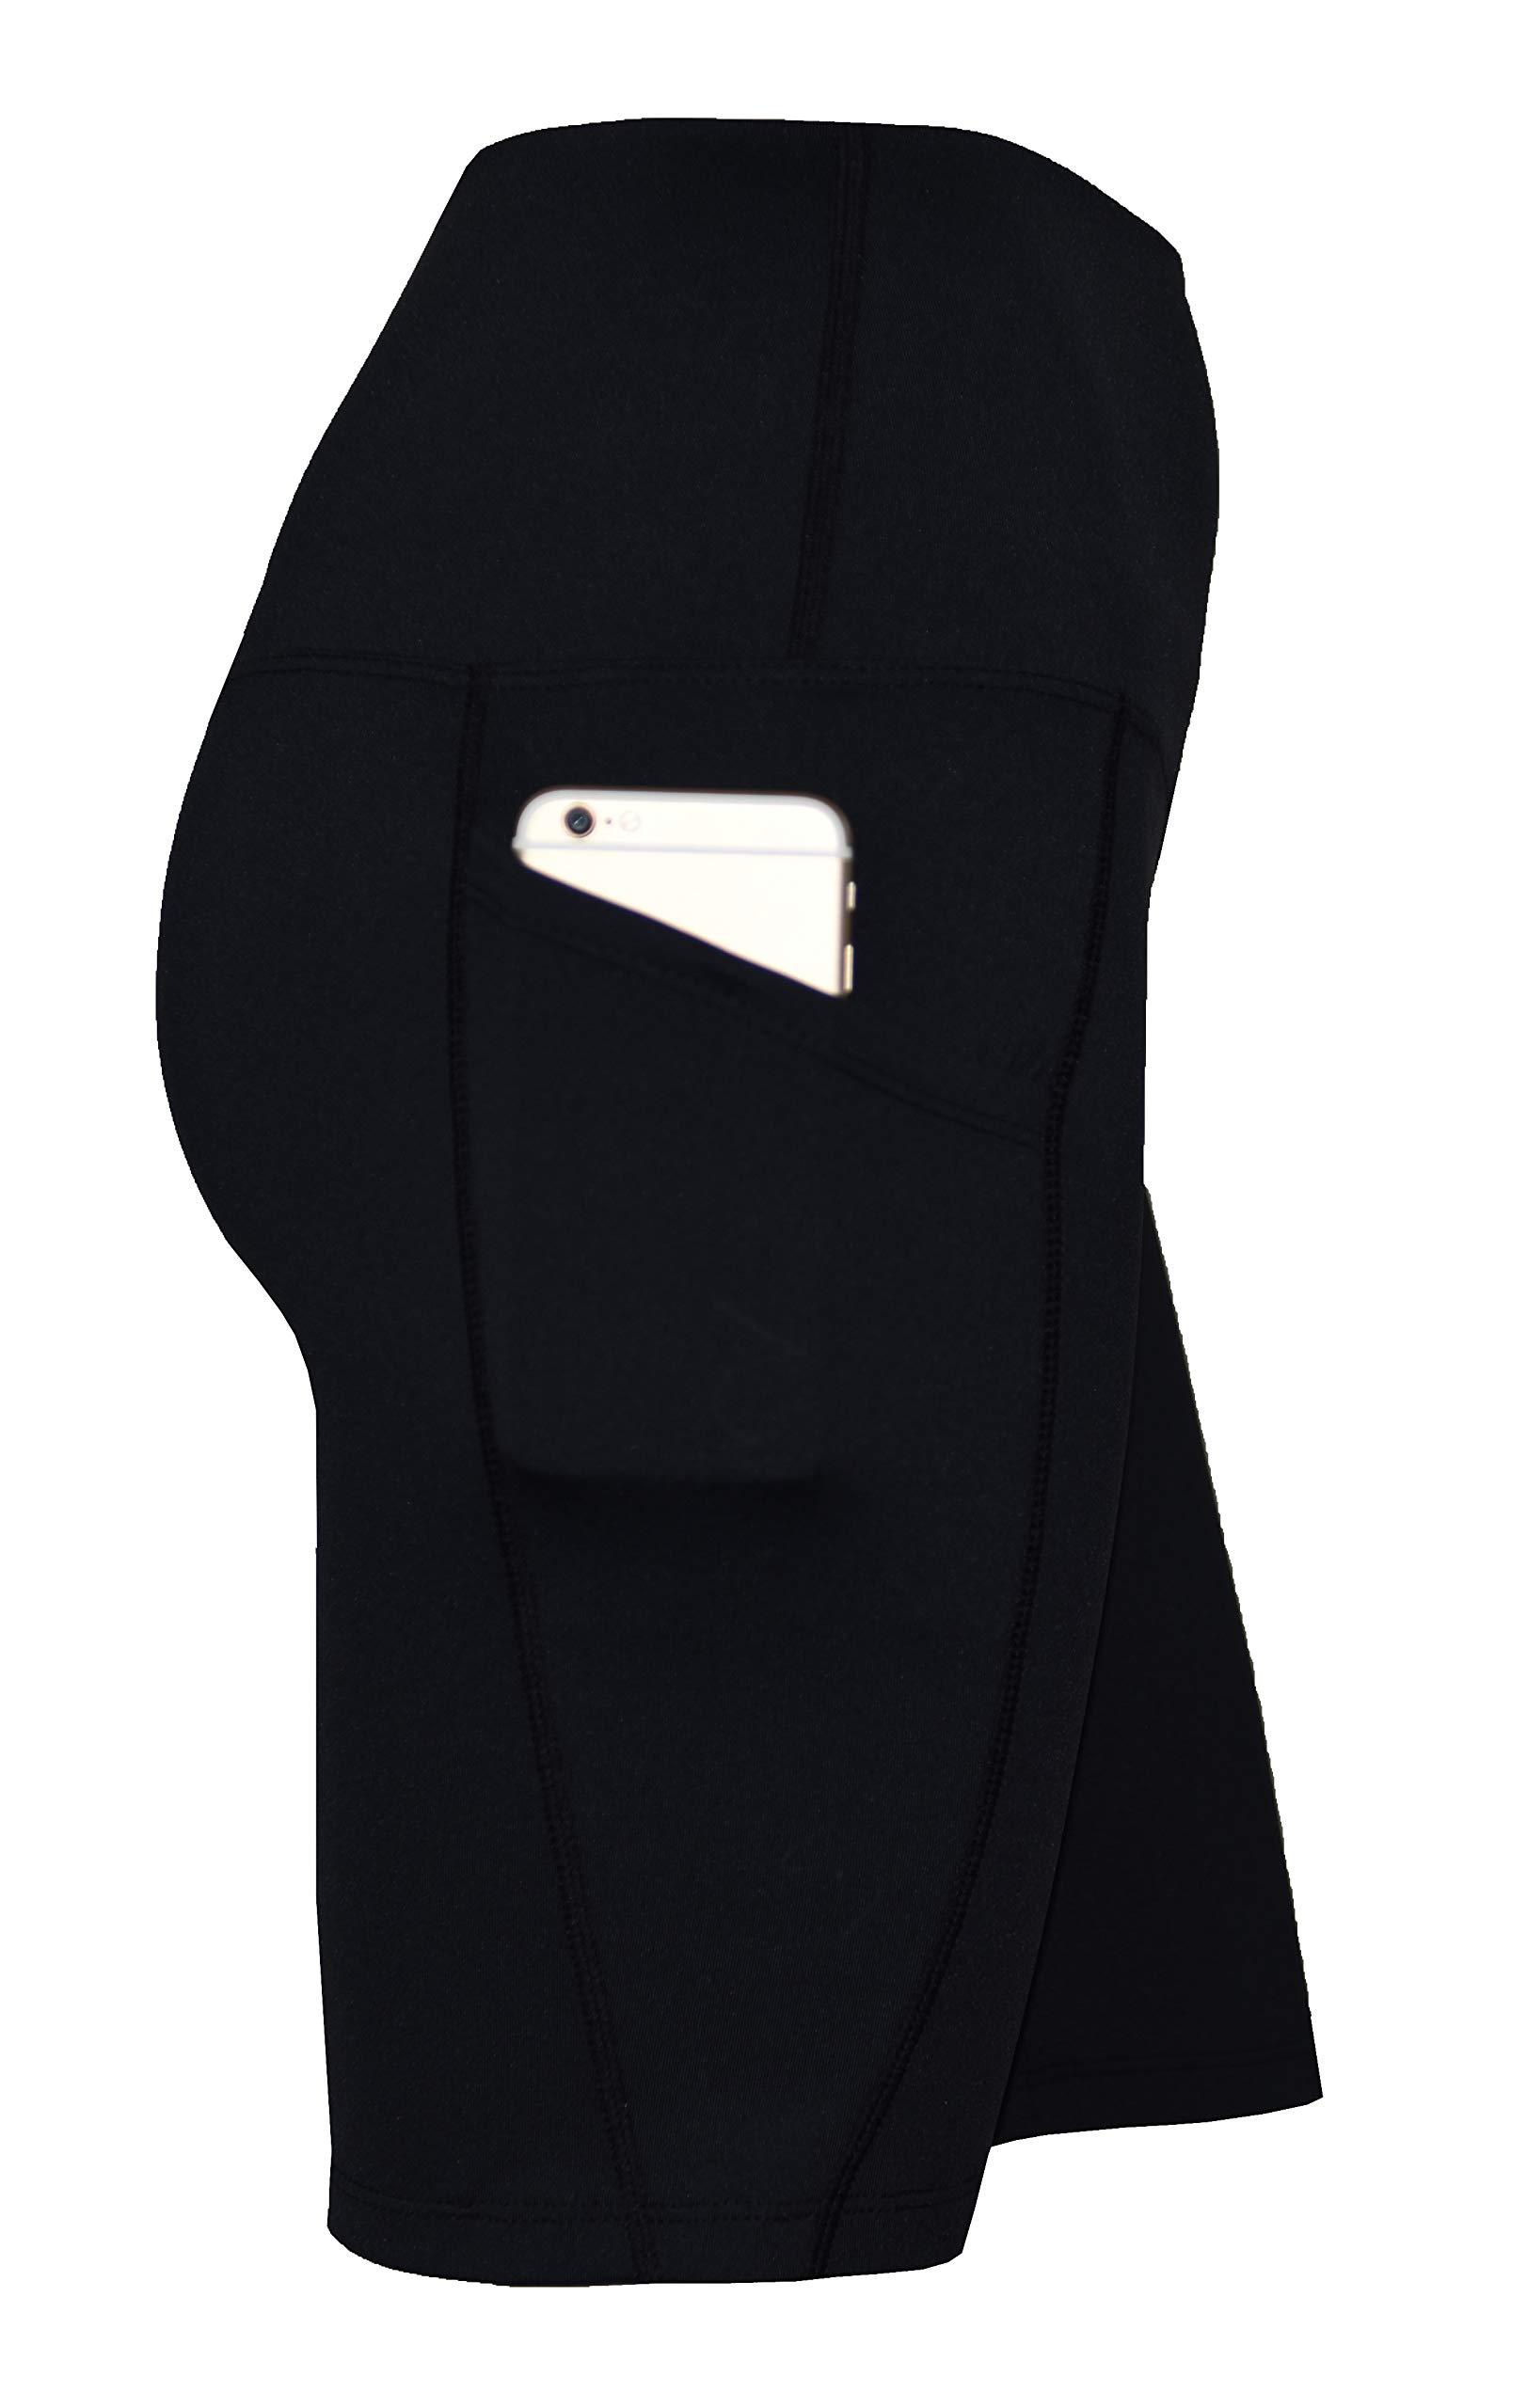 Private Island Women UV Swim Rash Guard Board Shorts Pants Yoga (XXL, Black) by Private Island